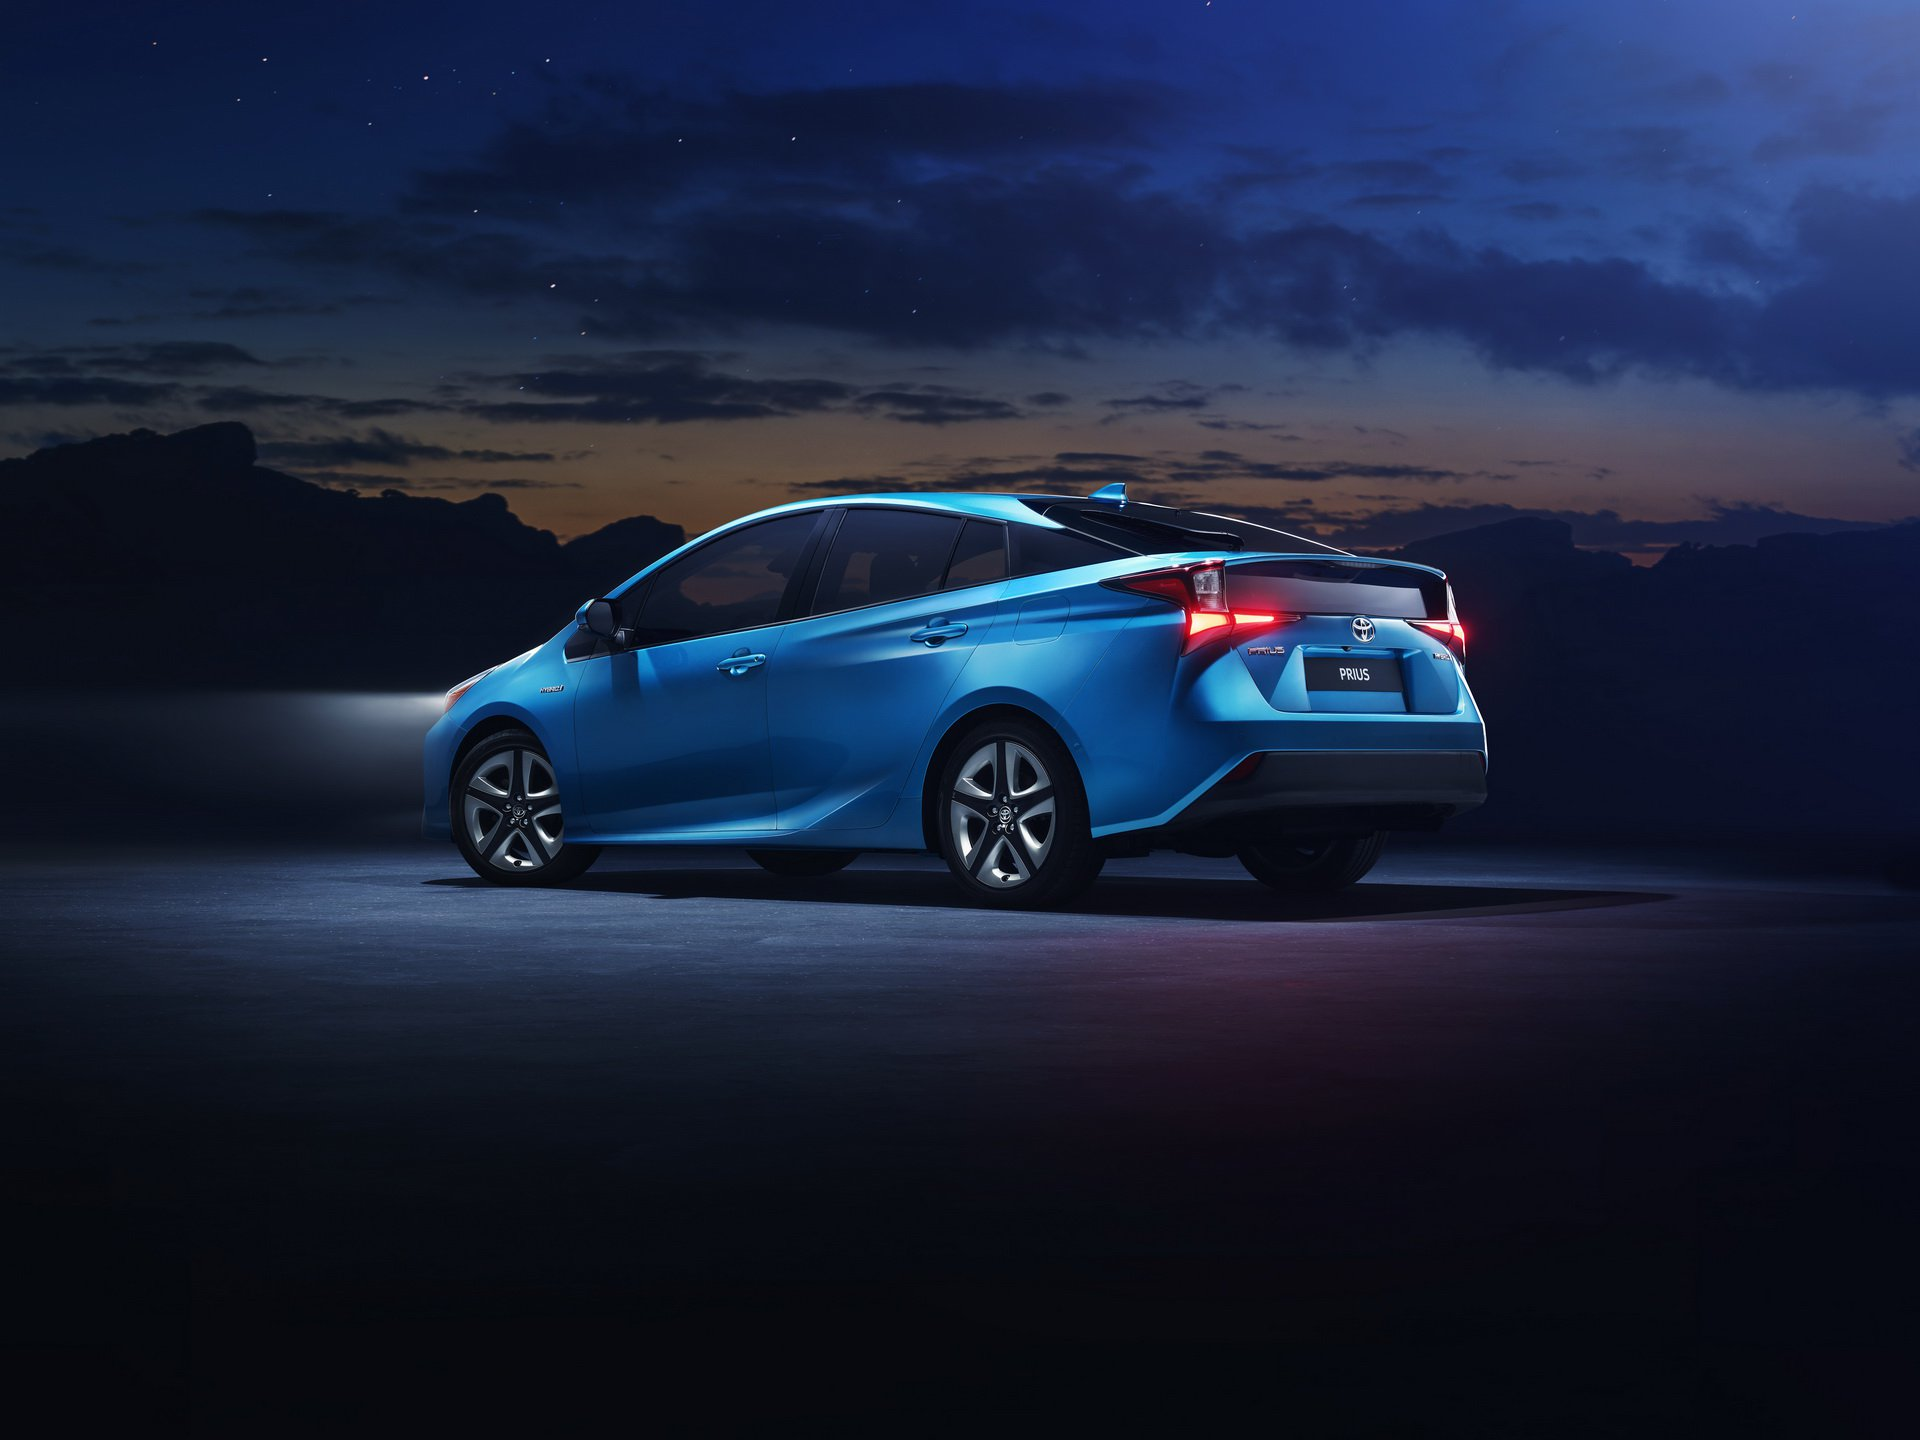 Toyota Prius Awd I